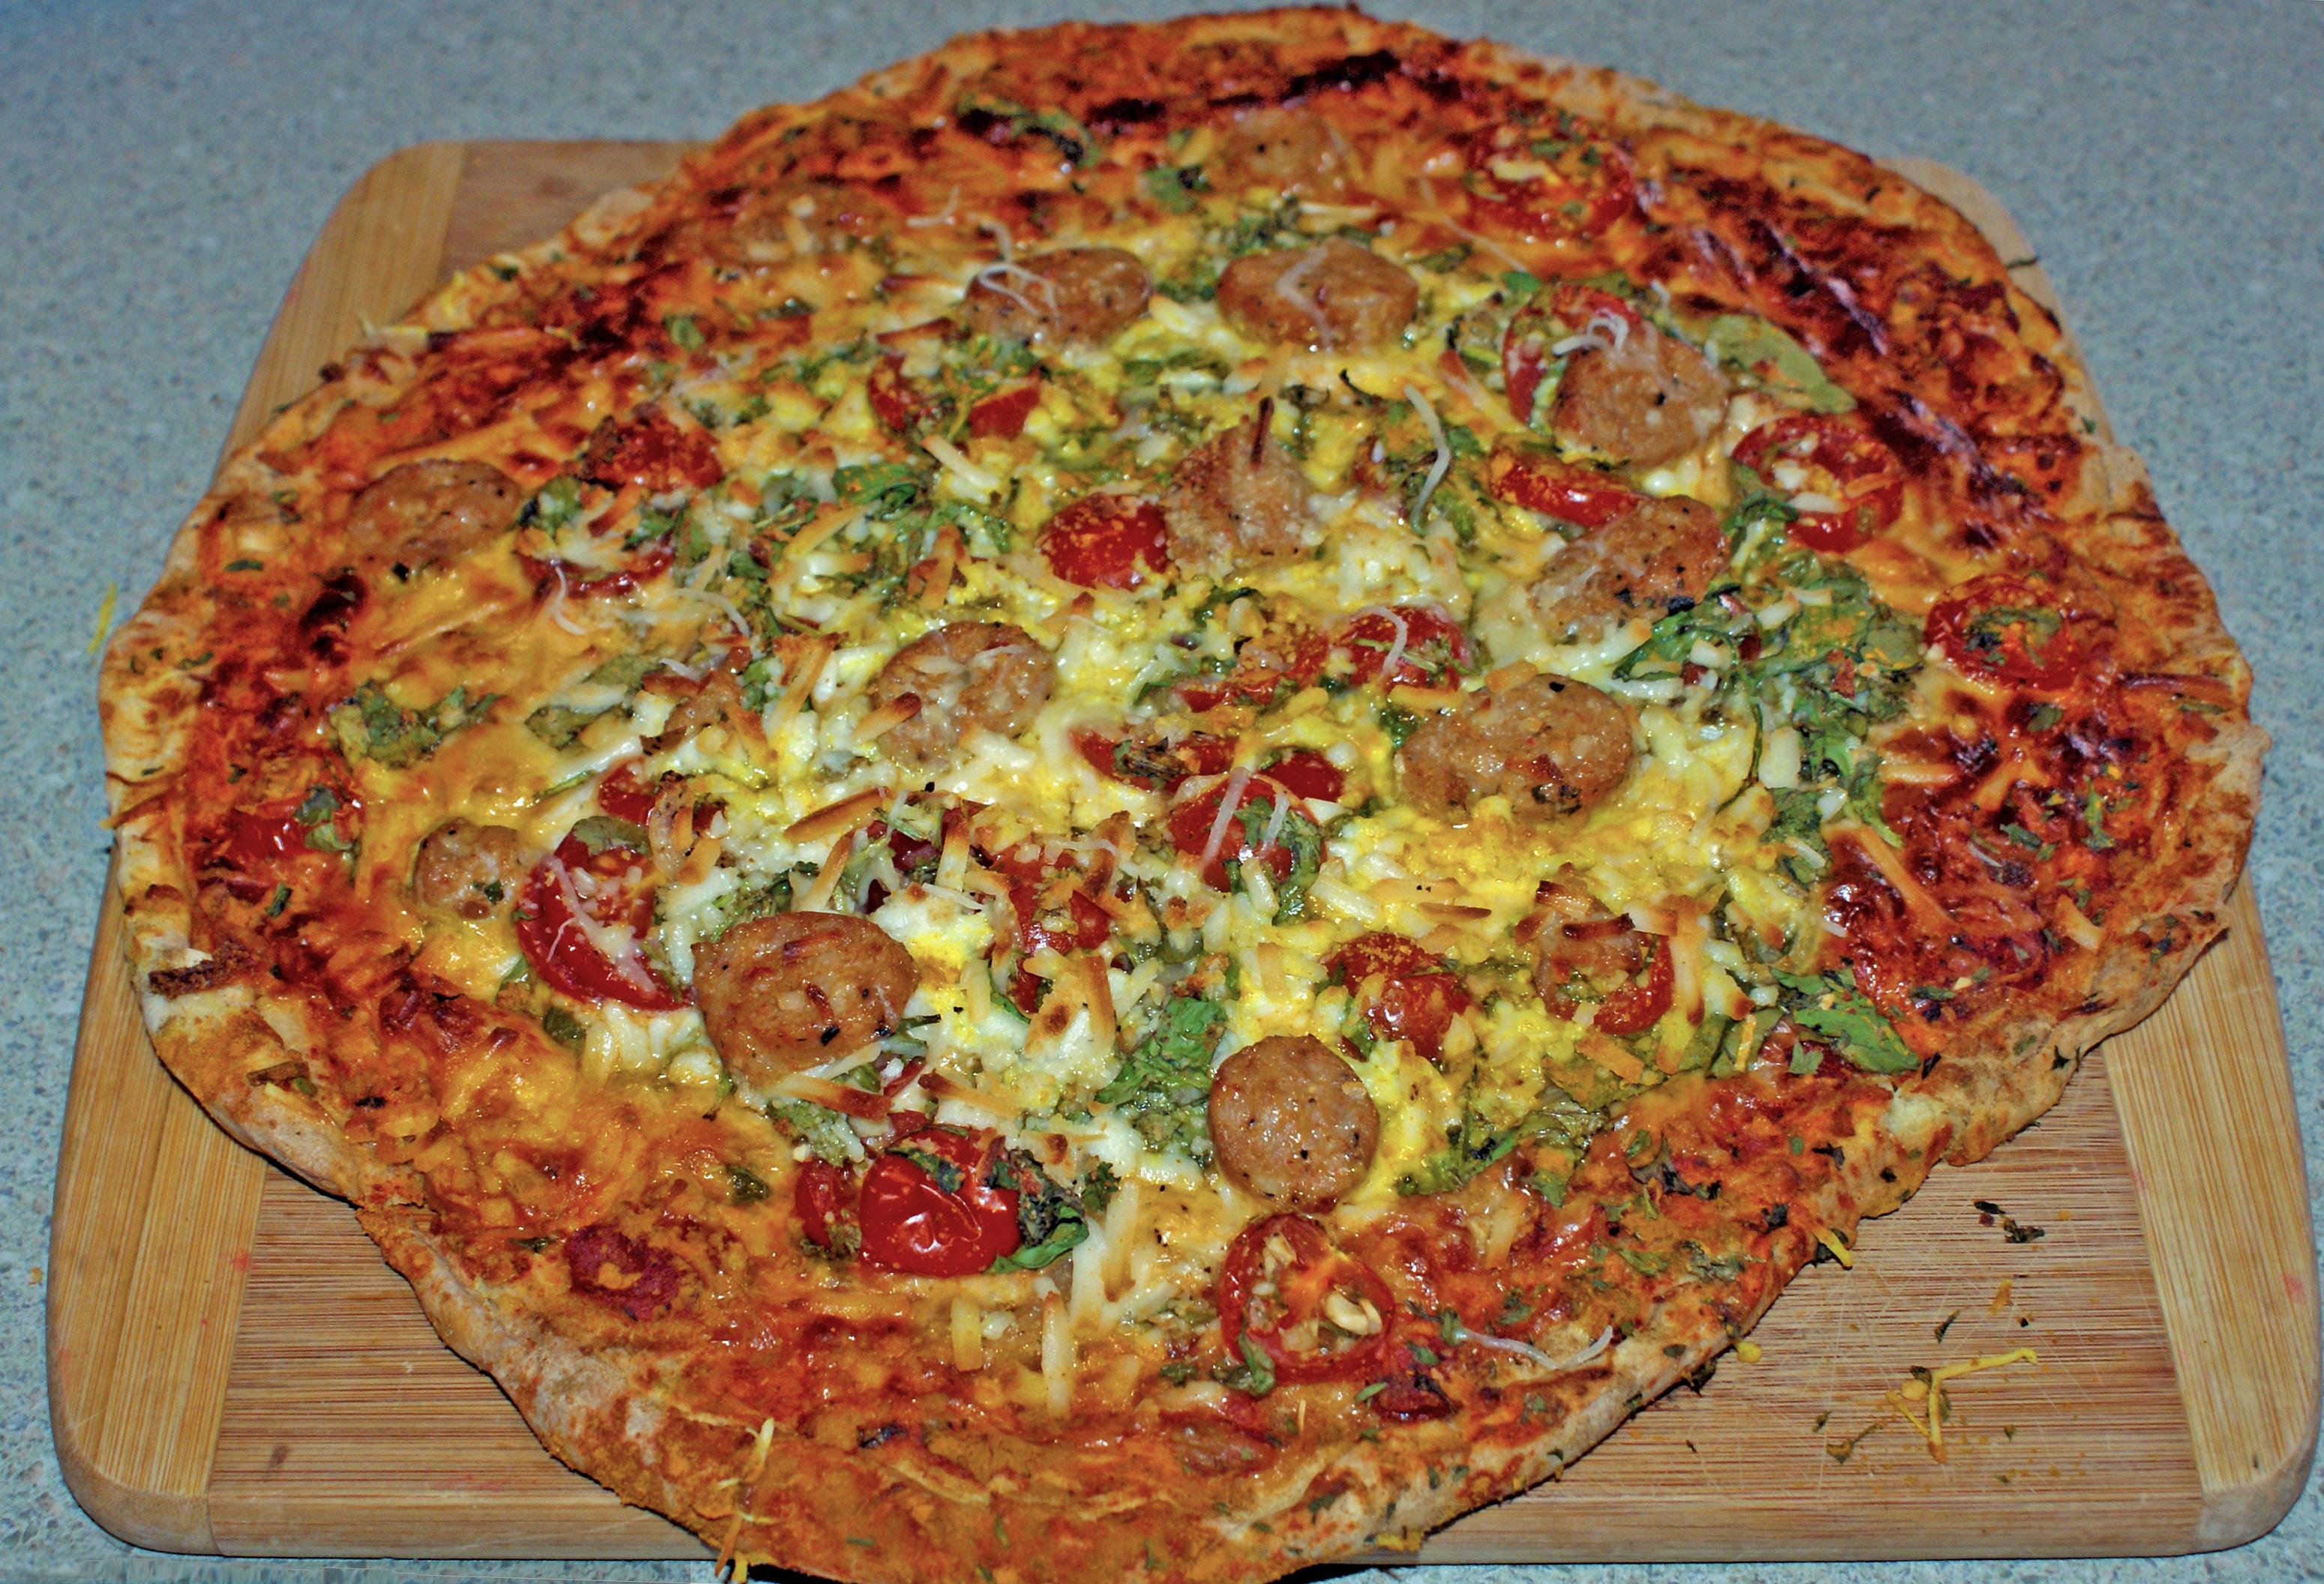 natasha rsquo s pizza